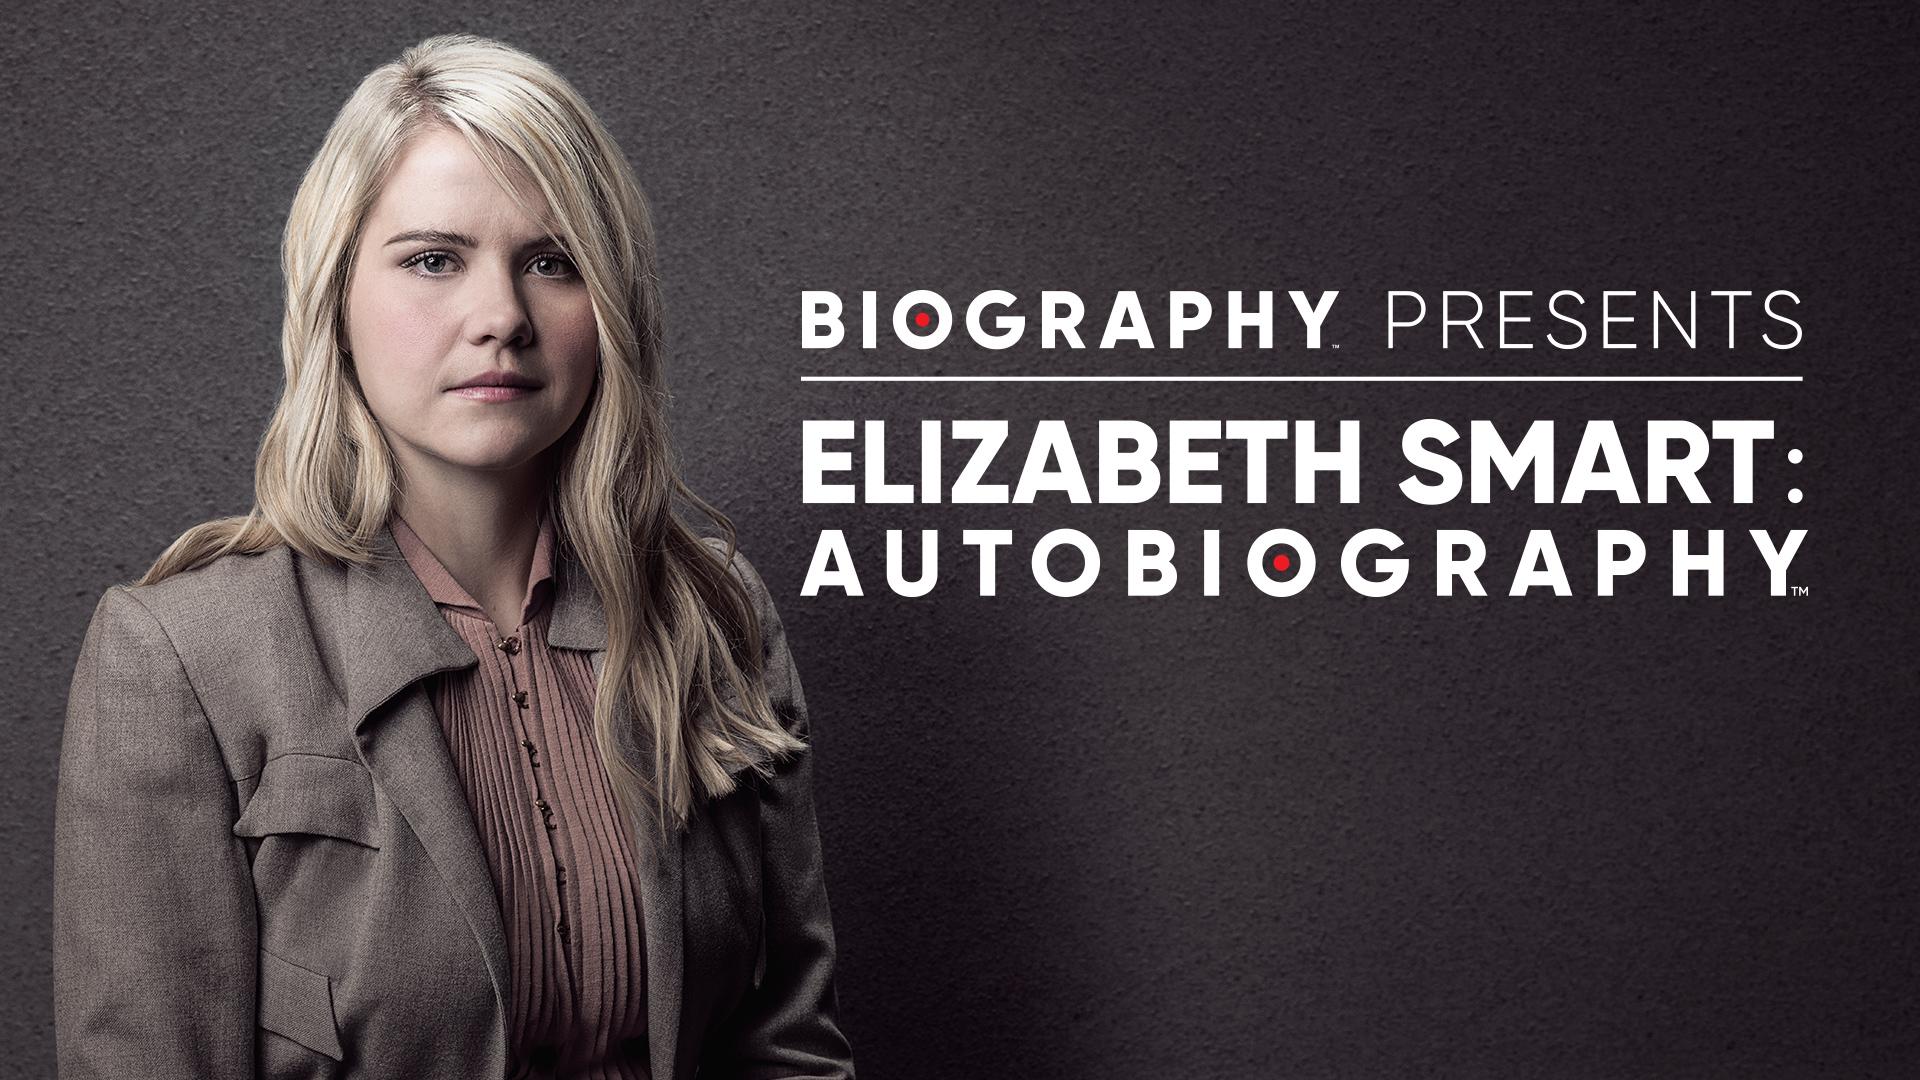 Elizabeth Smart: Autobiography